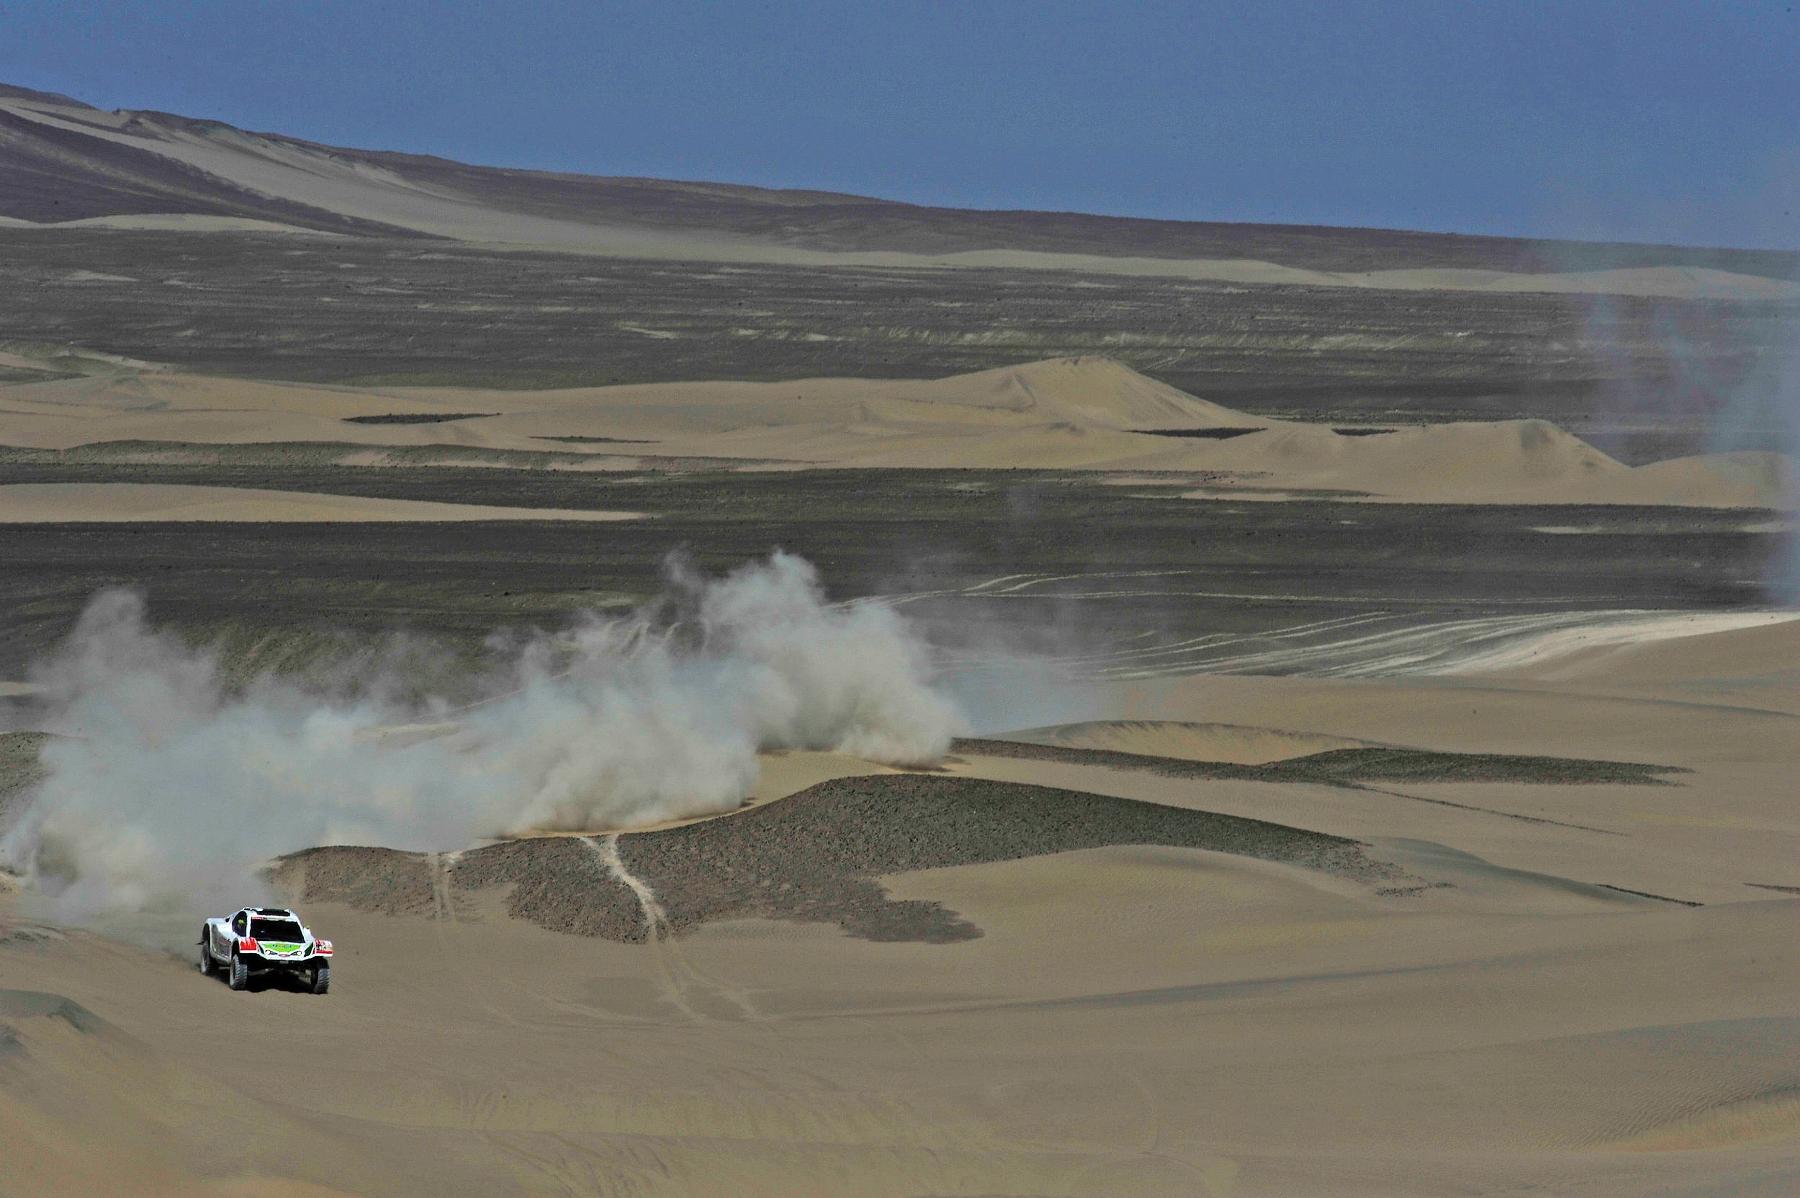 MOTORSPORT - DAKAR ARGENTINA CHILE PERU 2012 - STAGE 13 - NASCA (PER) TO PISCO (PER) - 14/01/2012 - PHOTO: DPPI